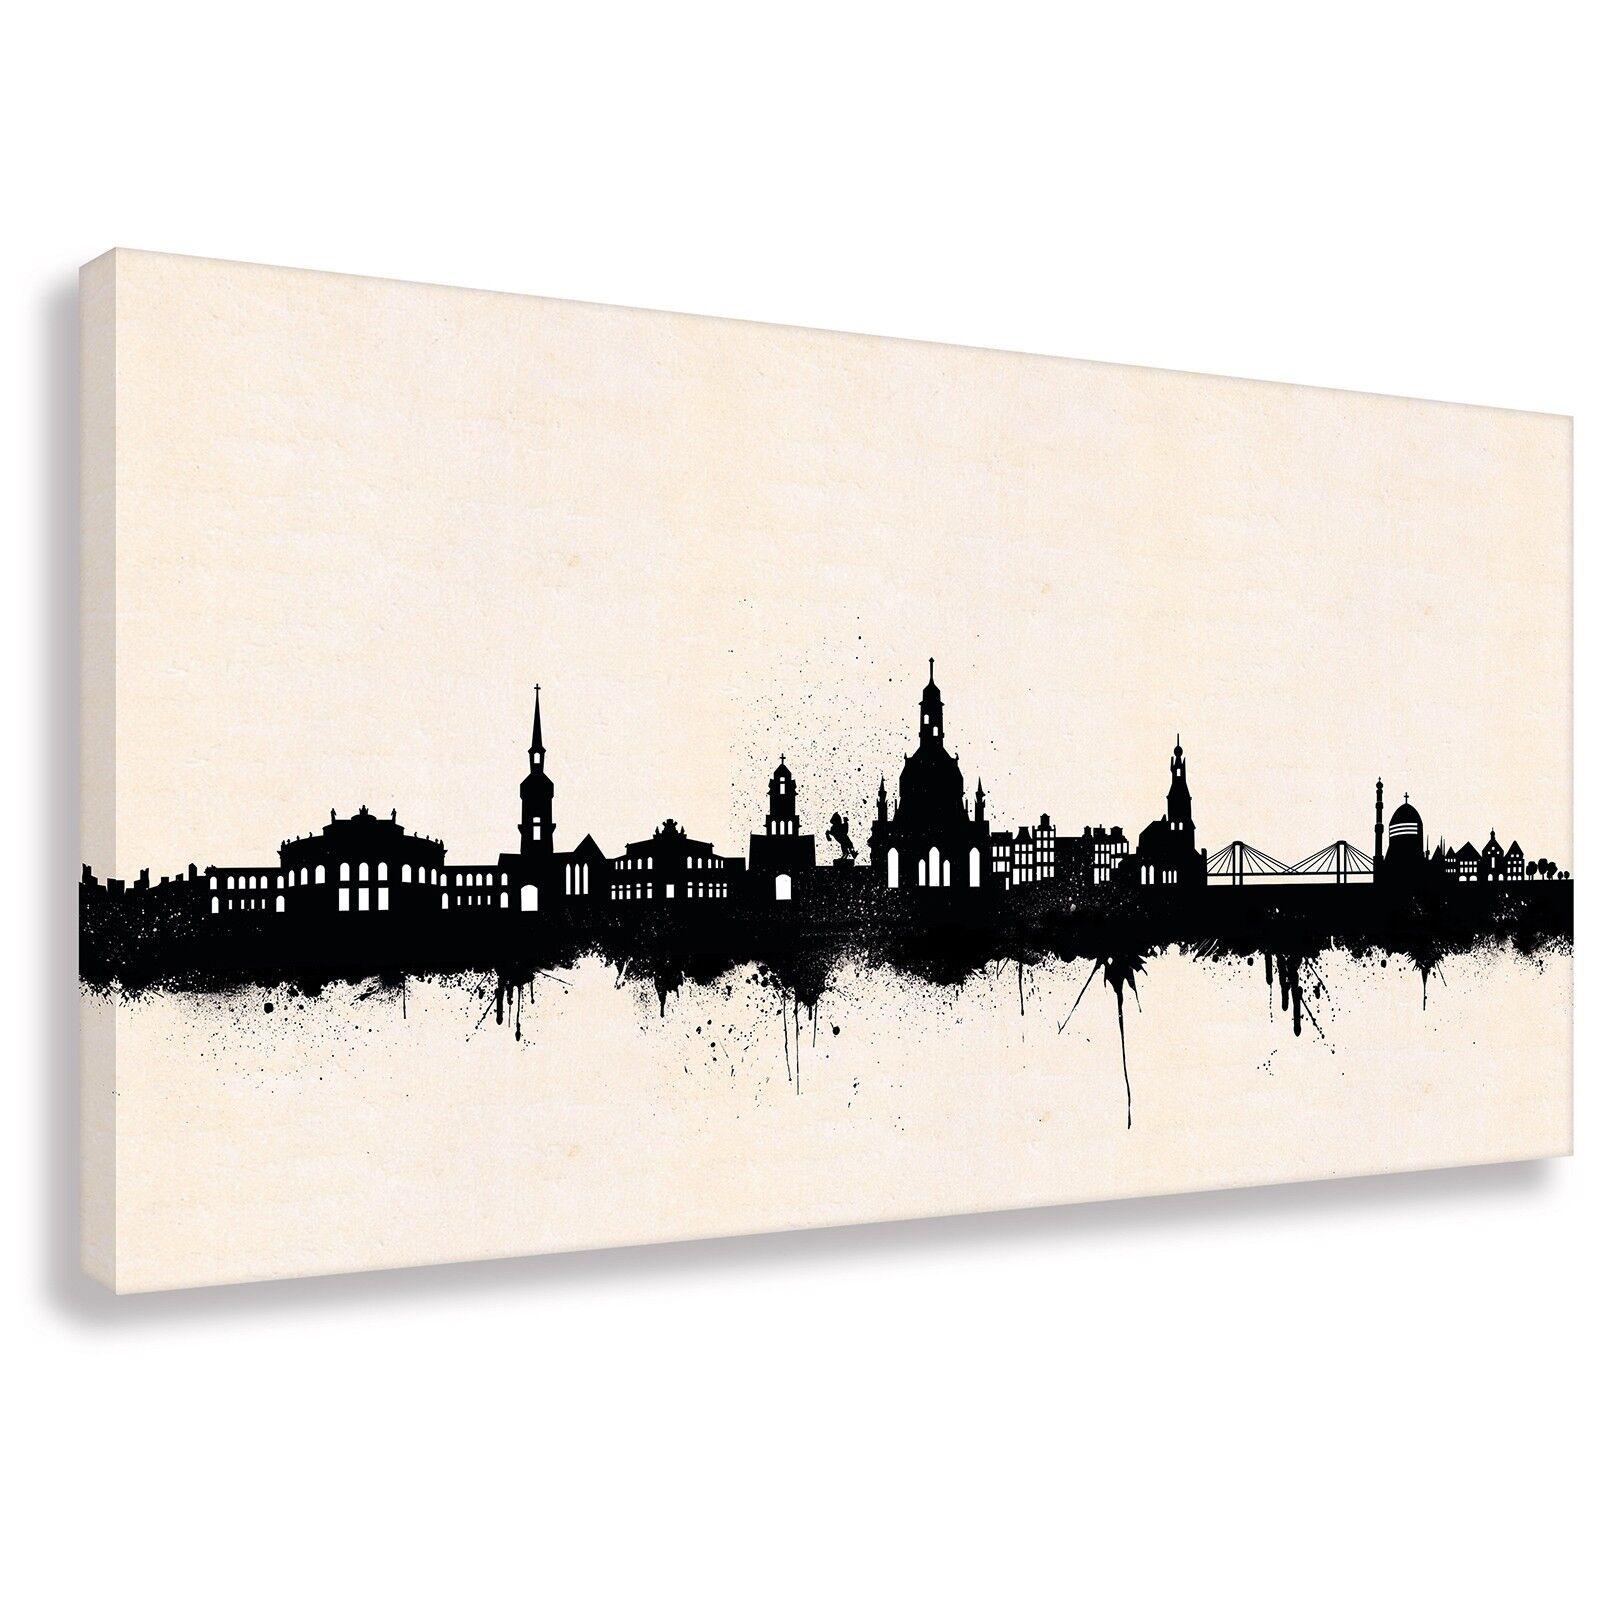 Dresden Bild auf Foto Leinwand Wandbild Poster Modern Design  100 cm*65 cm 513